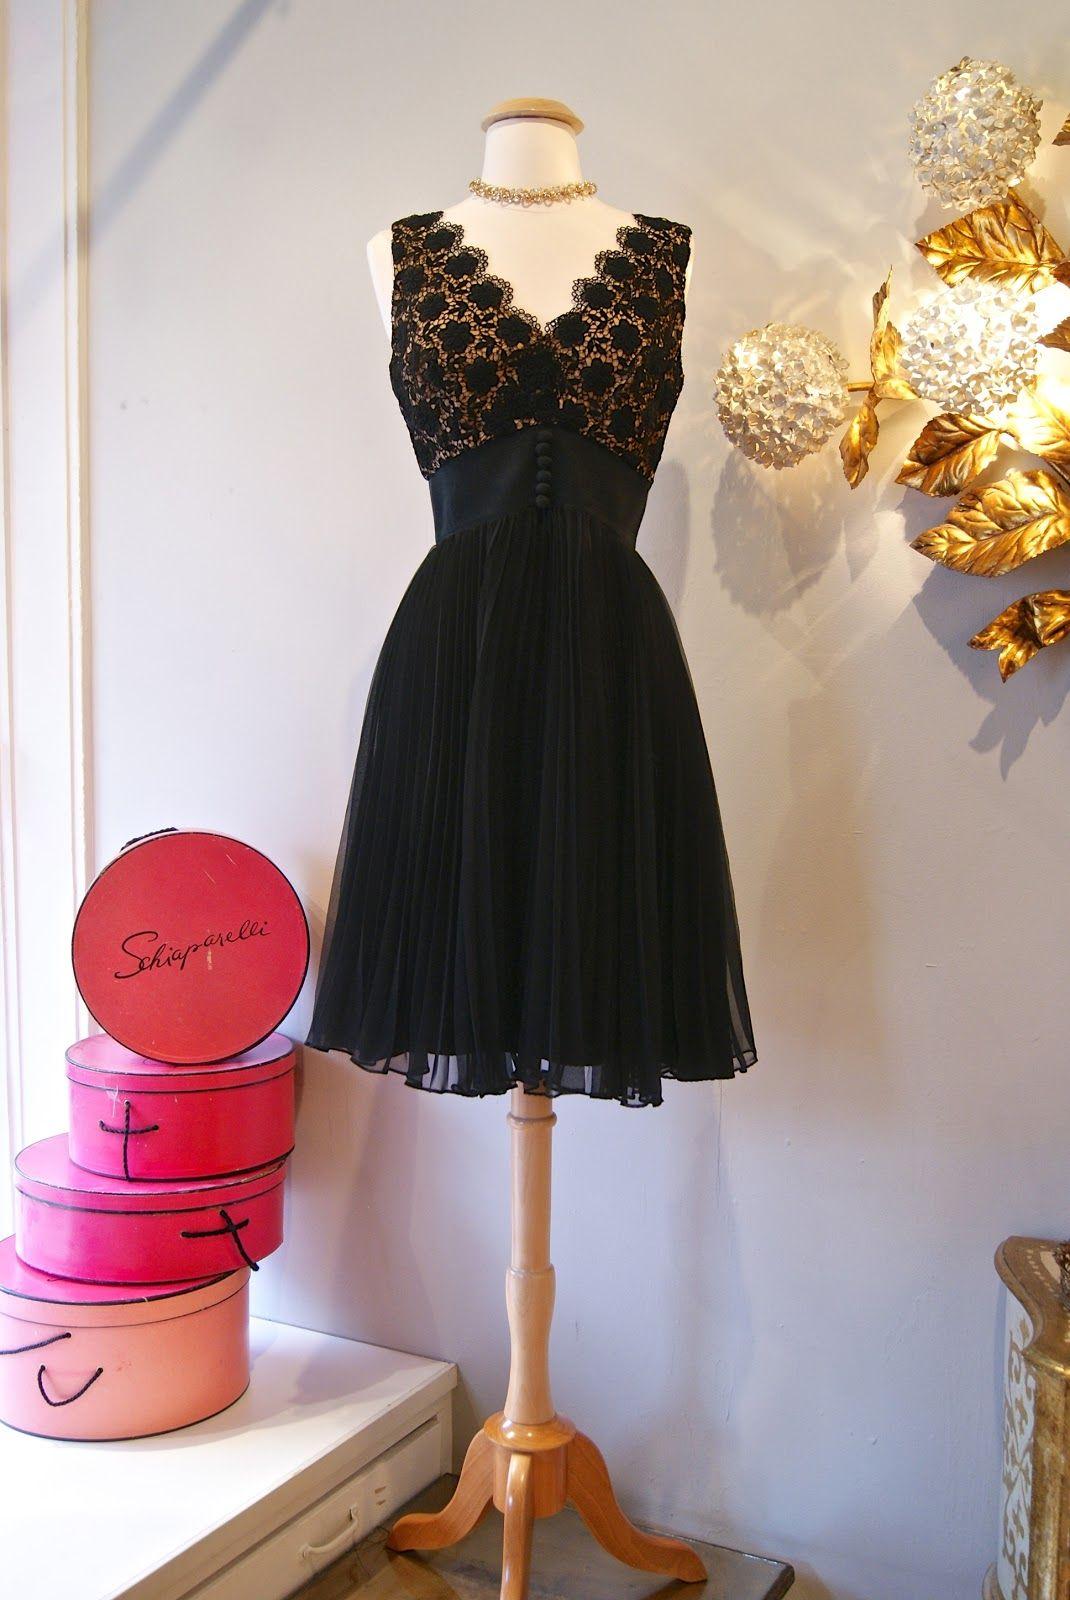 537f4dba446c Xtabay Vintage Clothing Boutique - Portland, Oregon: New Arrivals ...